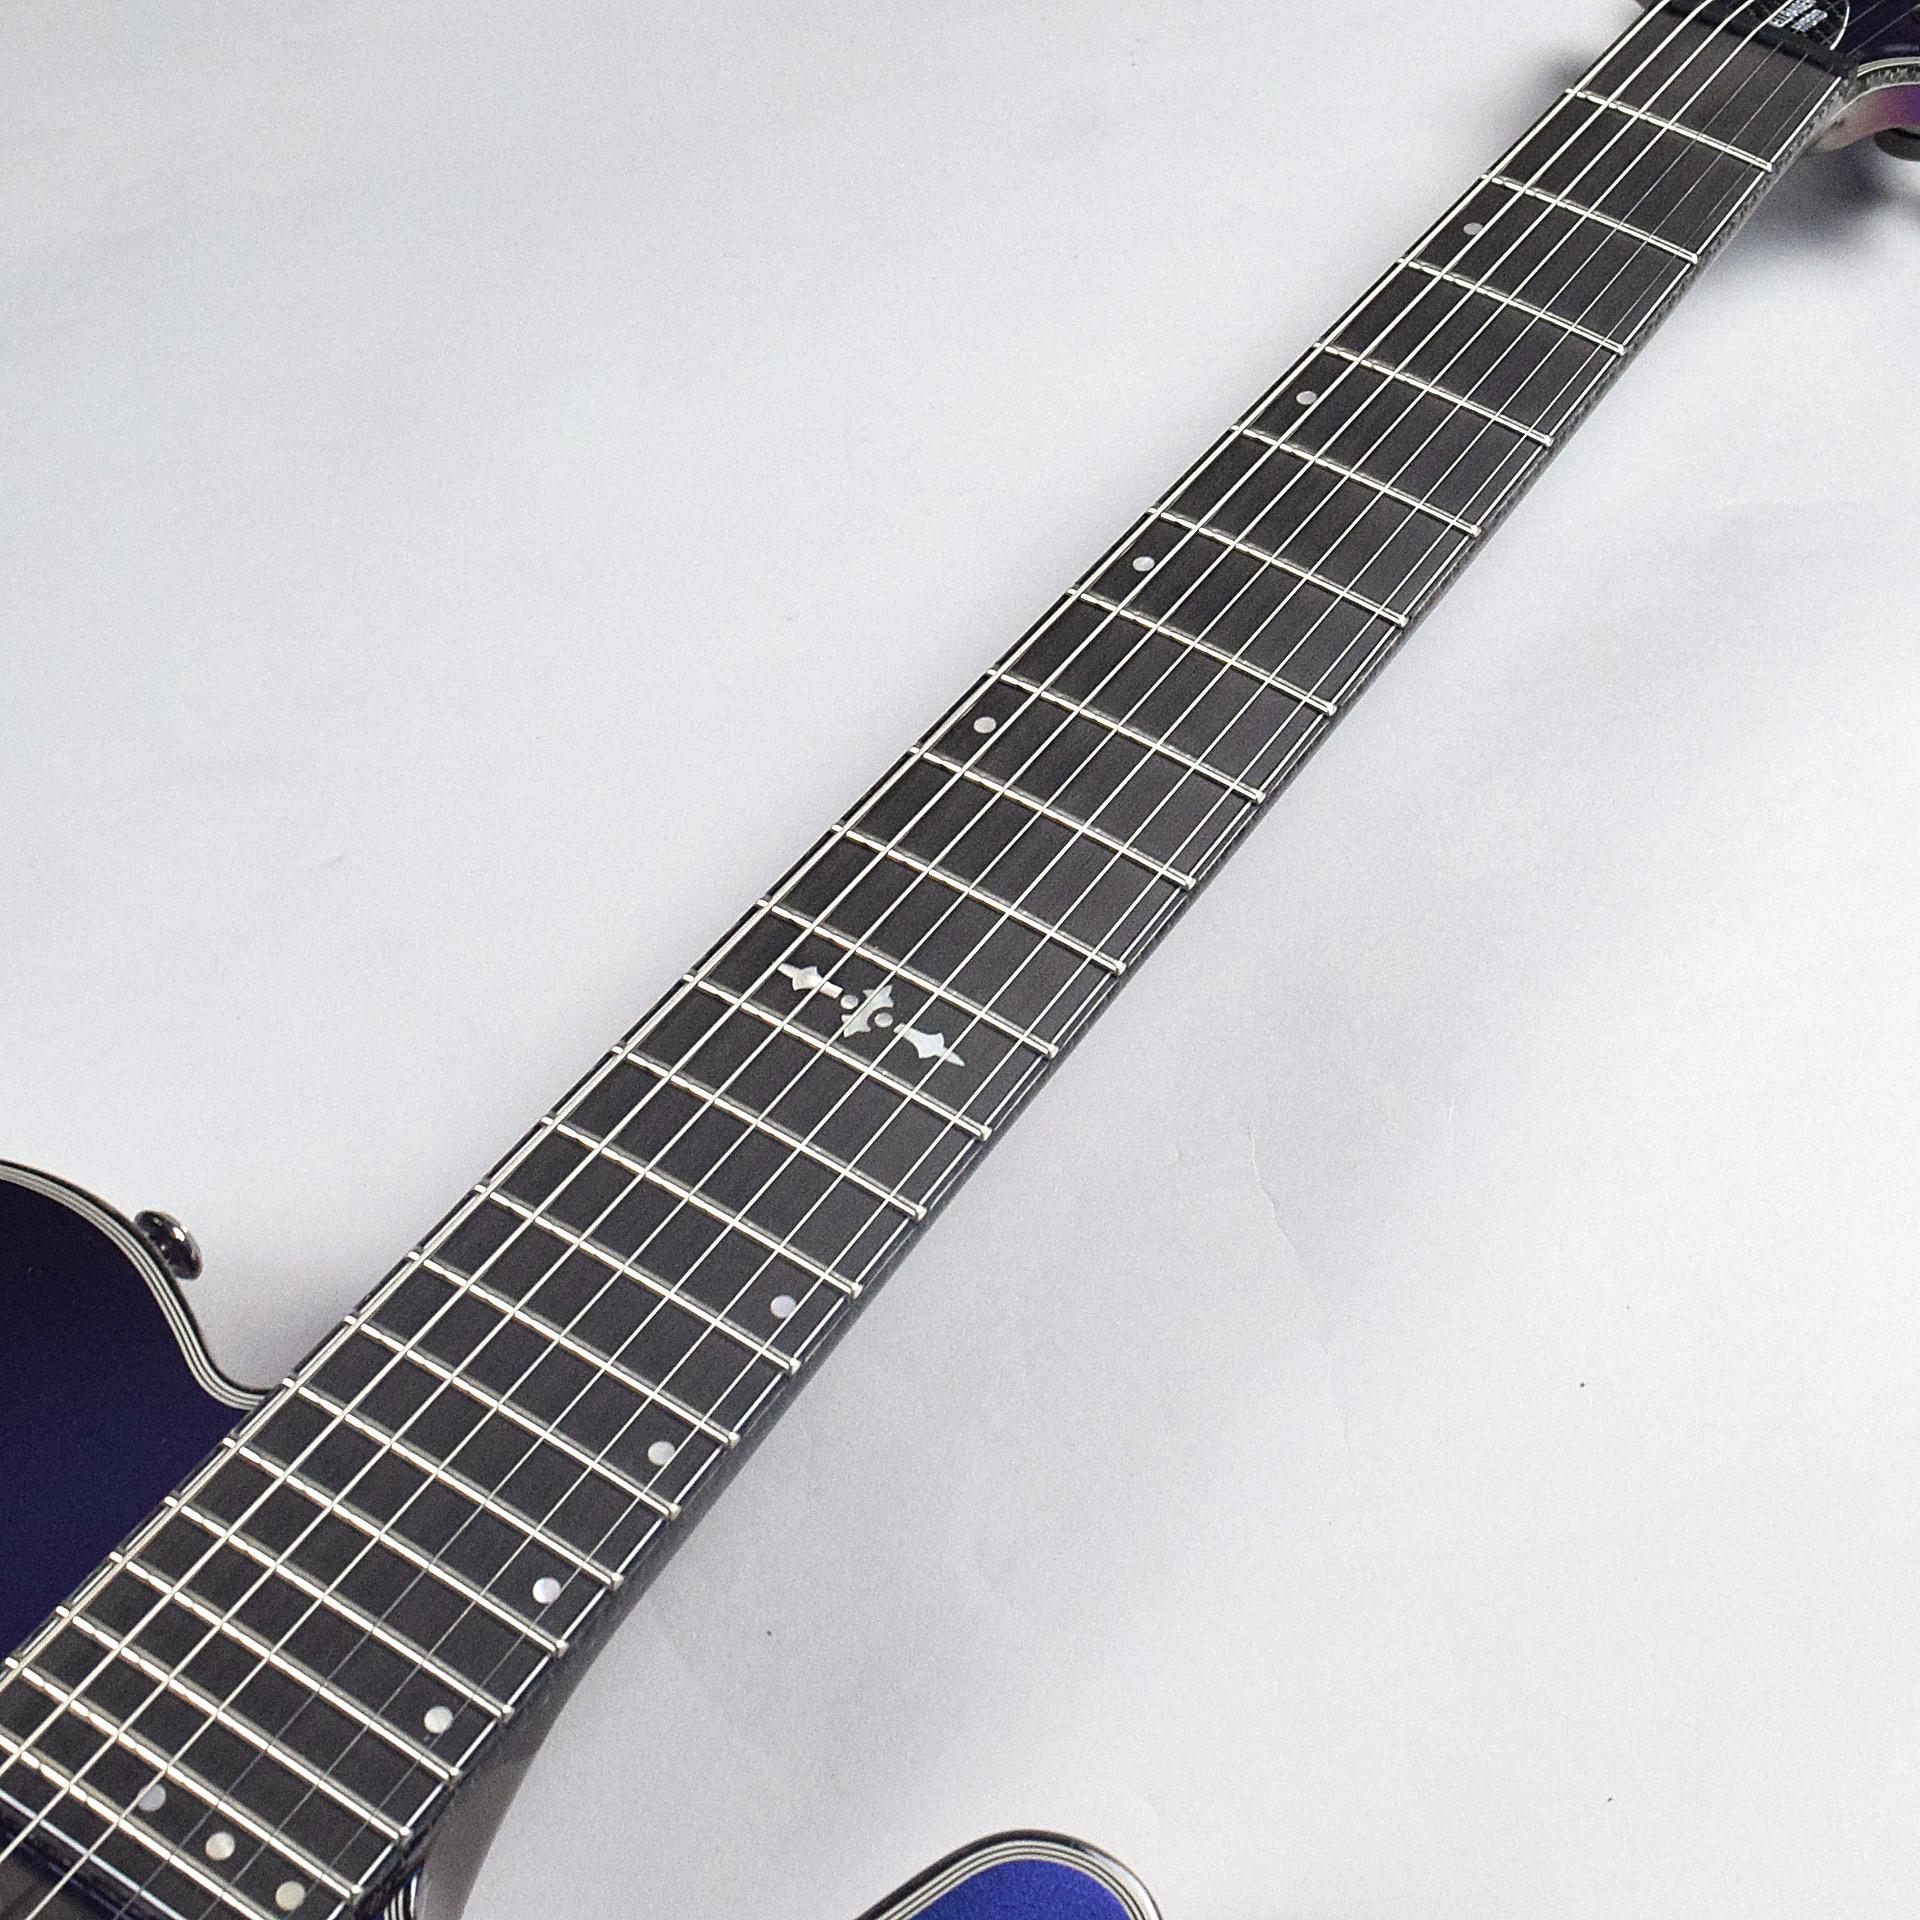 AD-PT-7HR-HB (UV)のヘッド裏-アップ画像